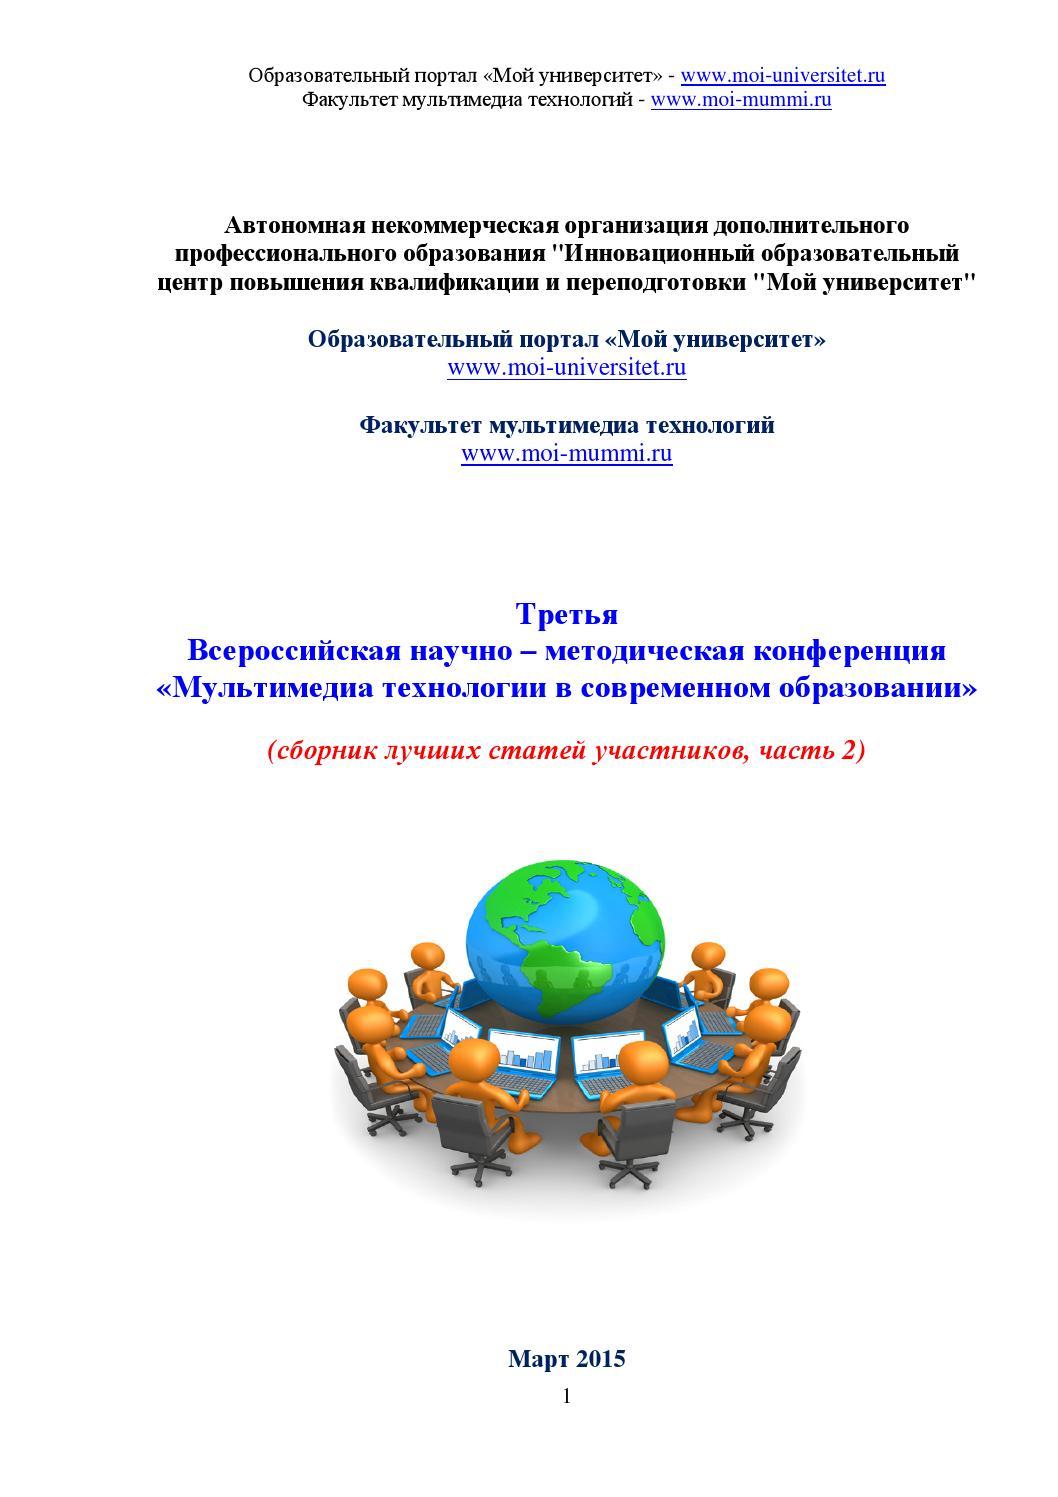 moi-universitet.ru